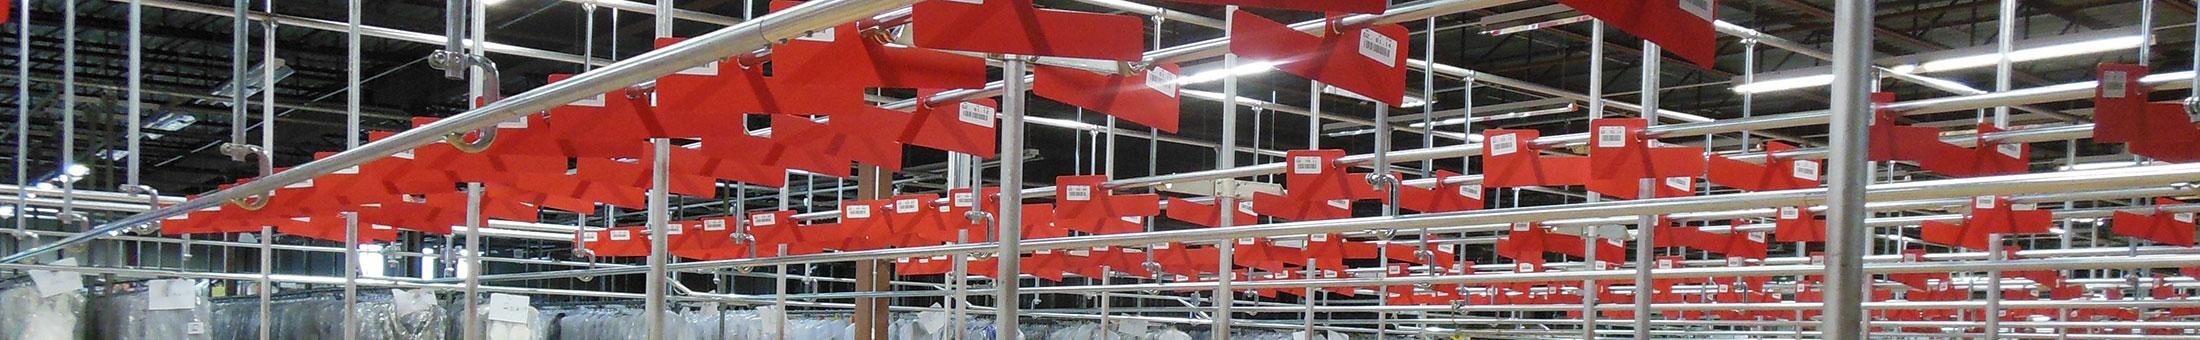 E-Commerce Warehouse & Distribution